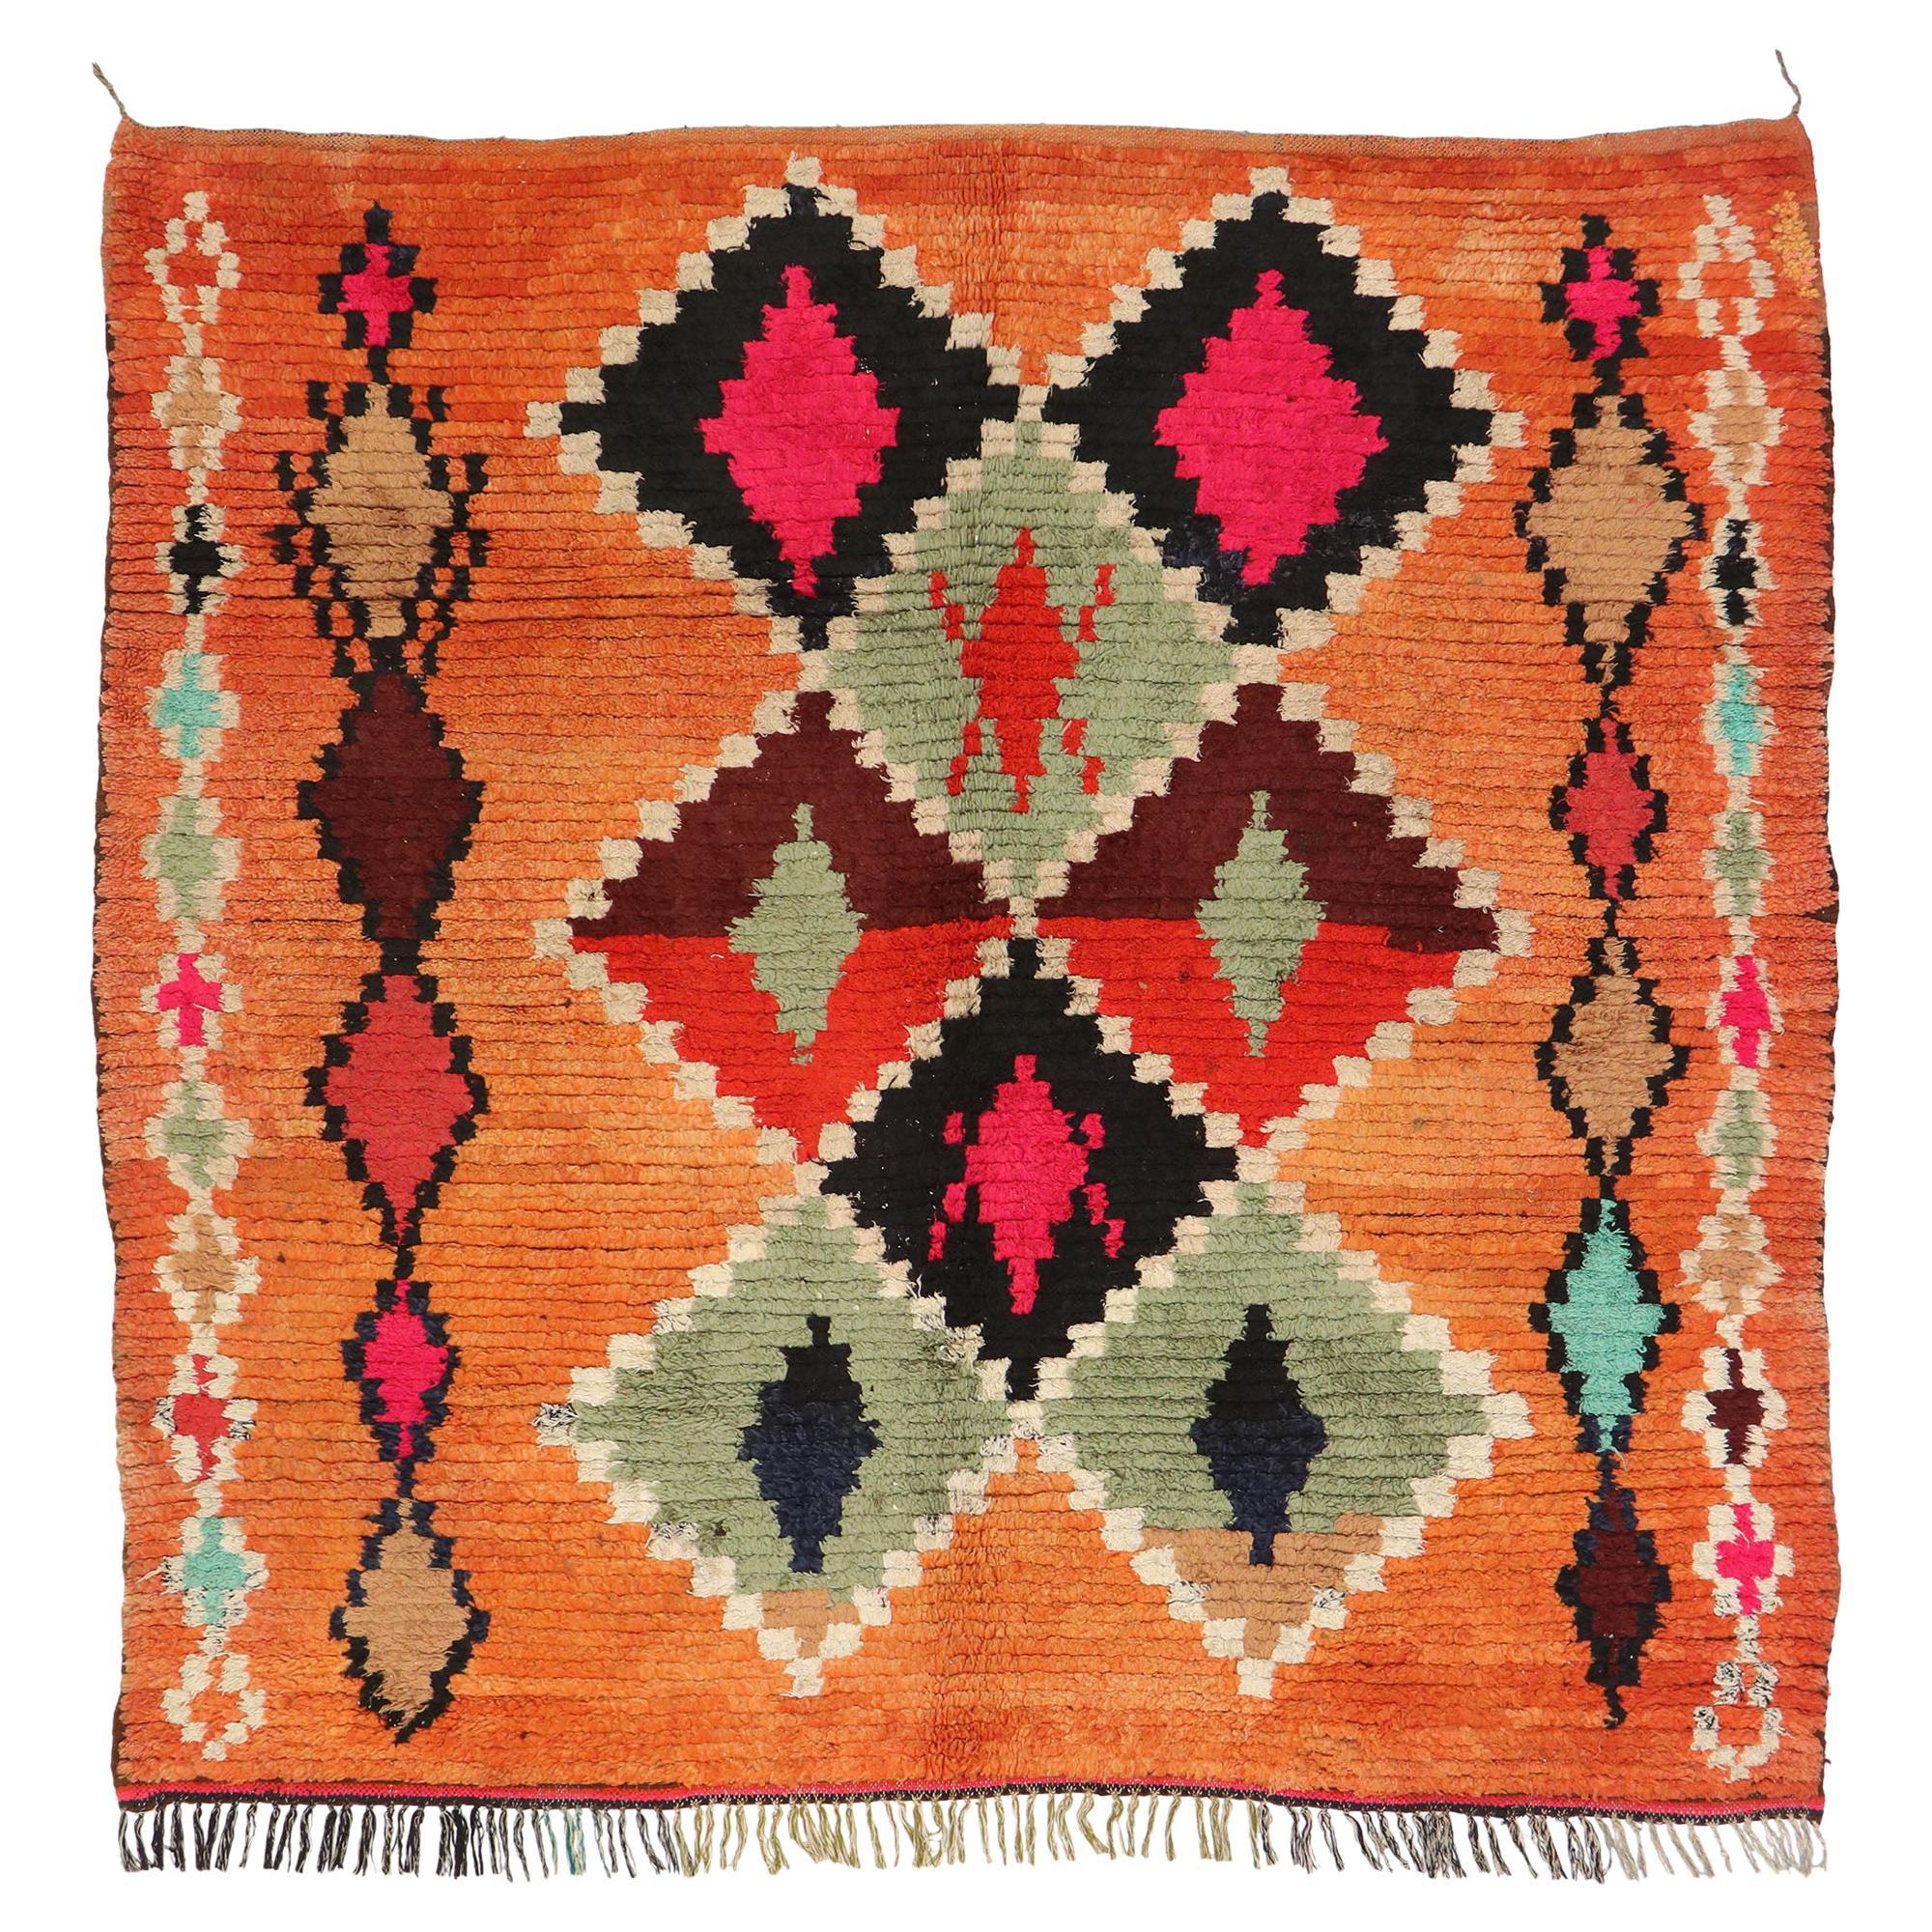 Vintage Berber Moroccan Rug with Postmodern Boho Chic Style